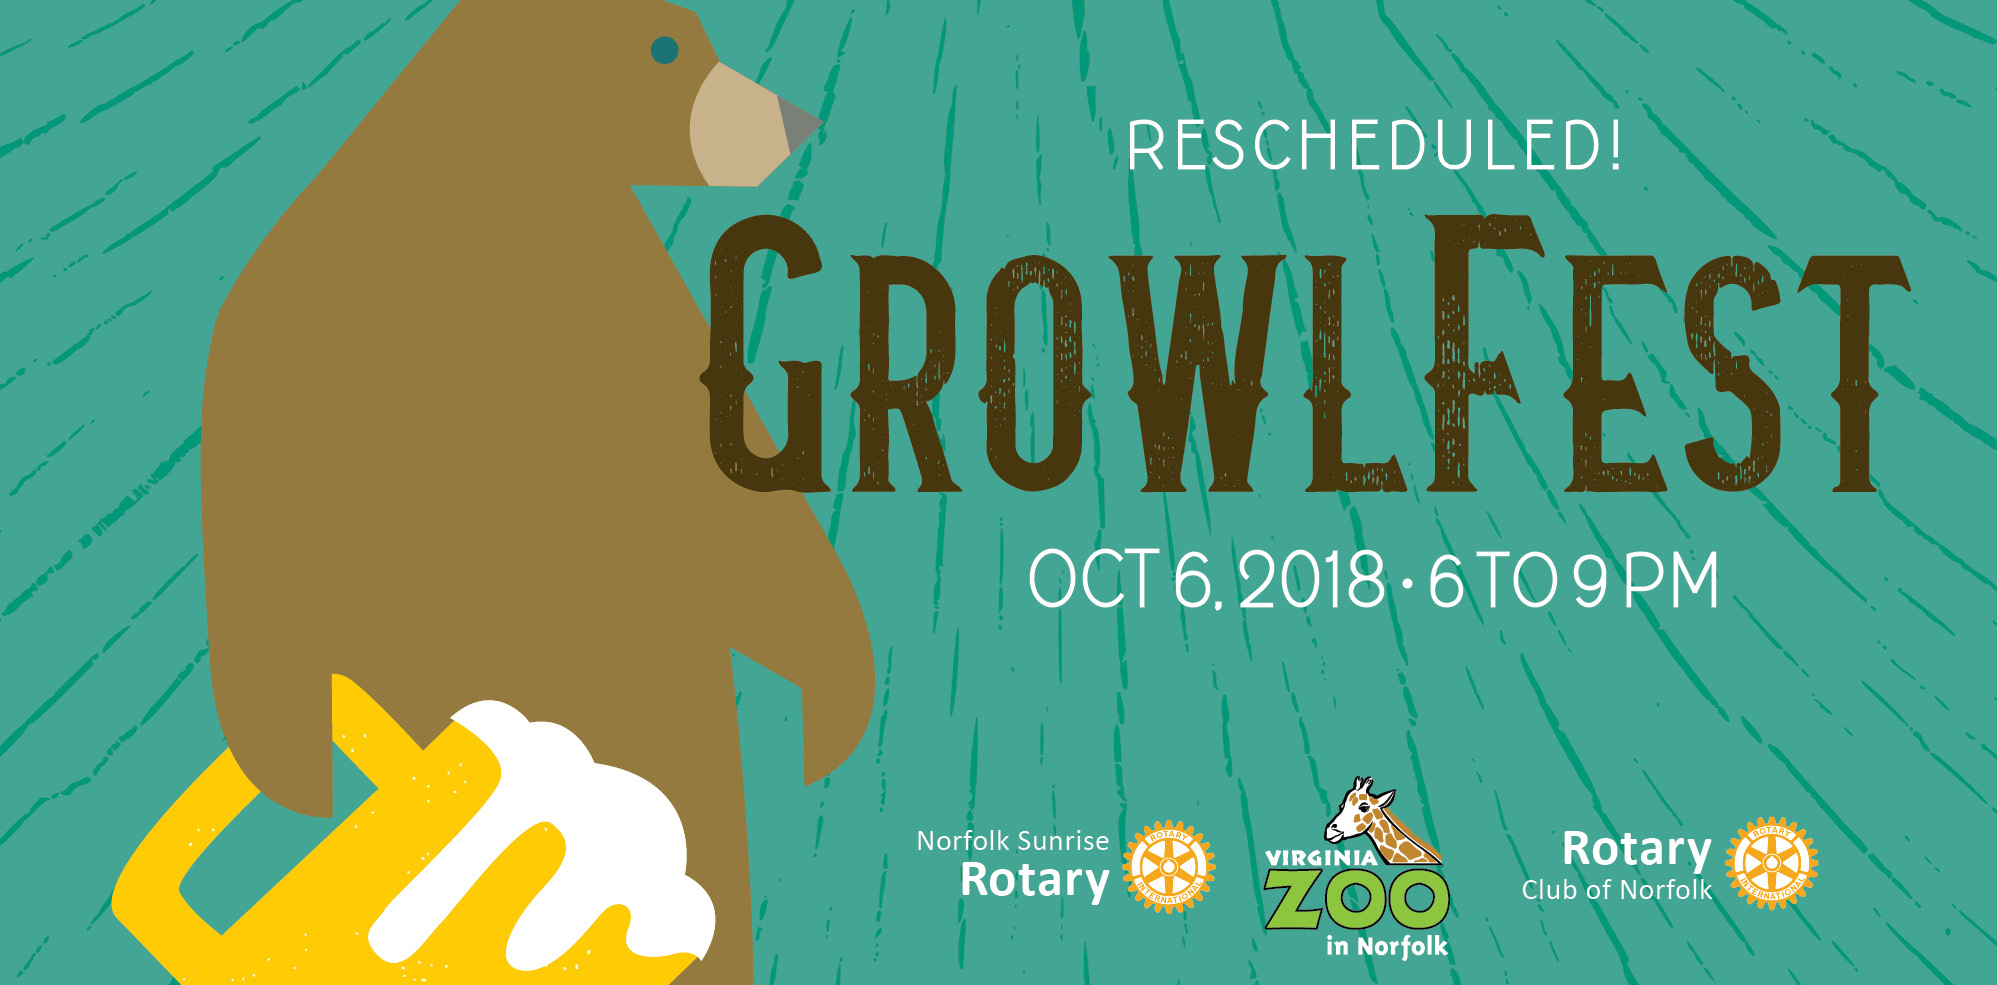 VAZOO_Growl Fest 2018_rescheduled_home